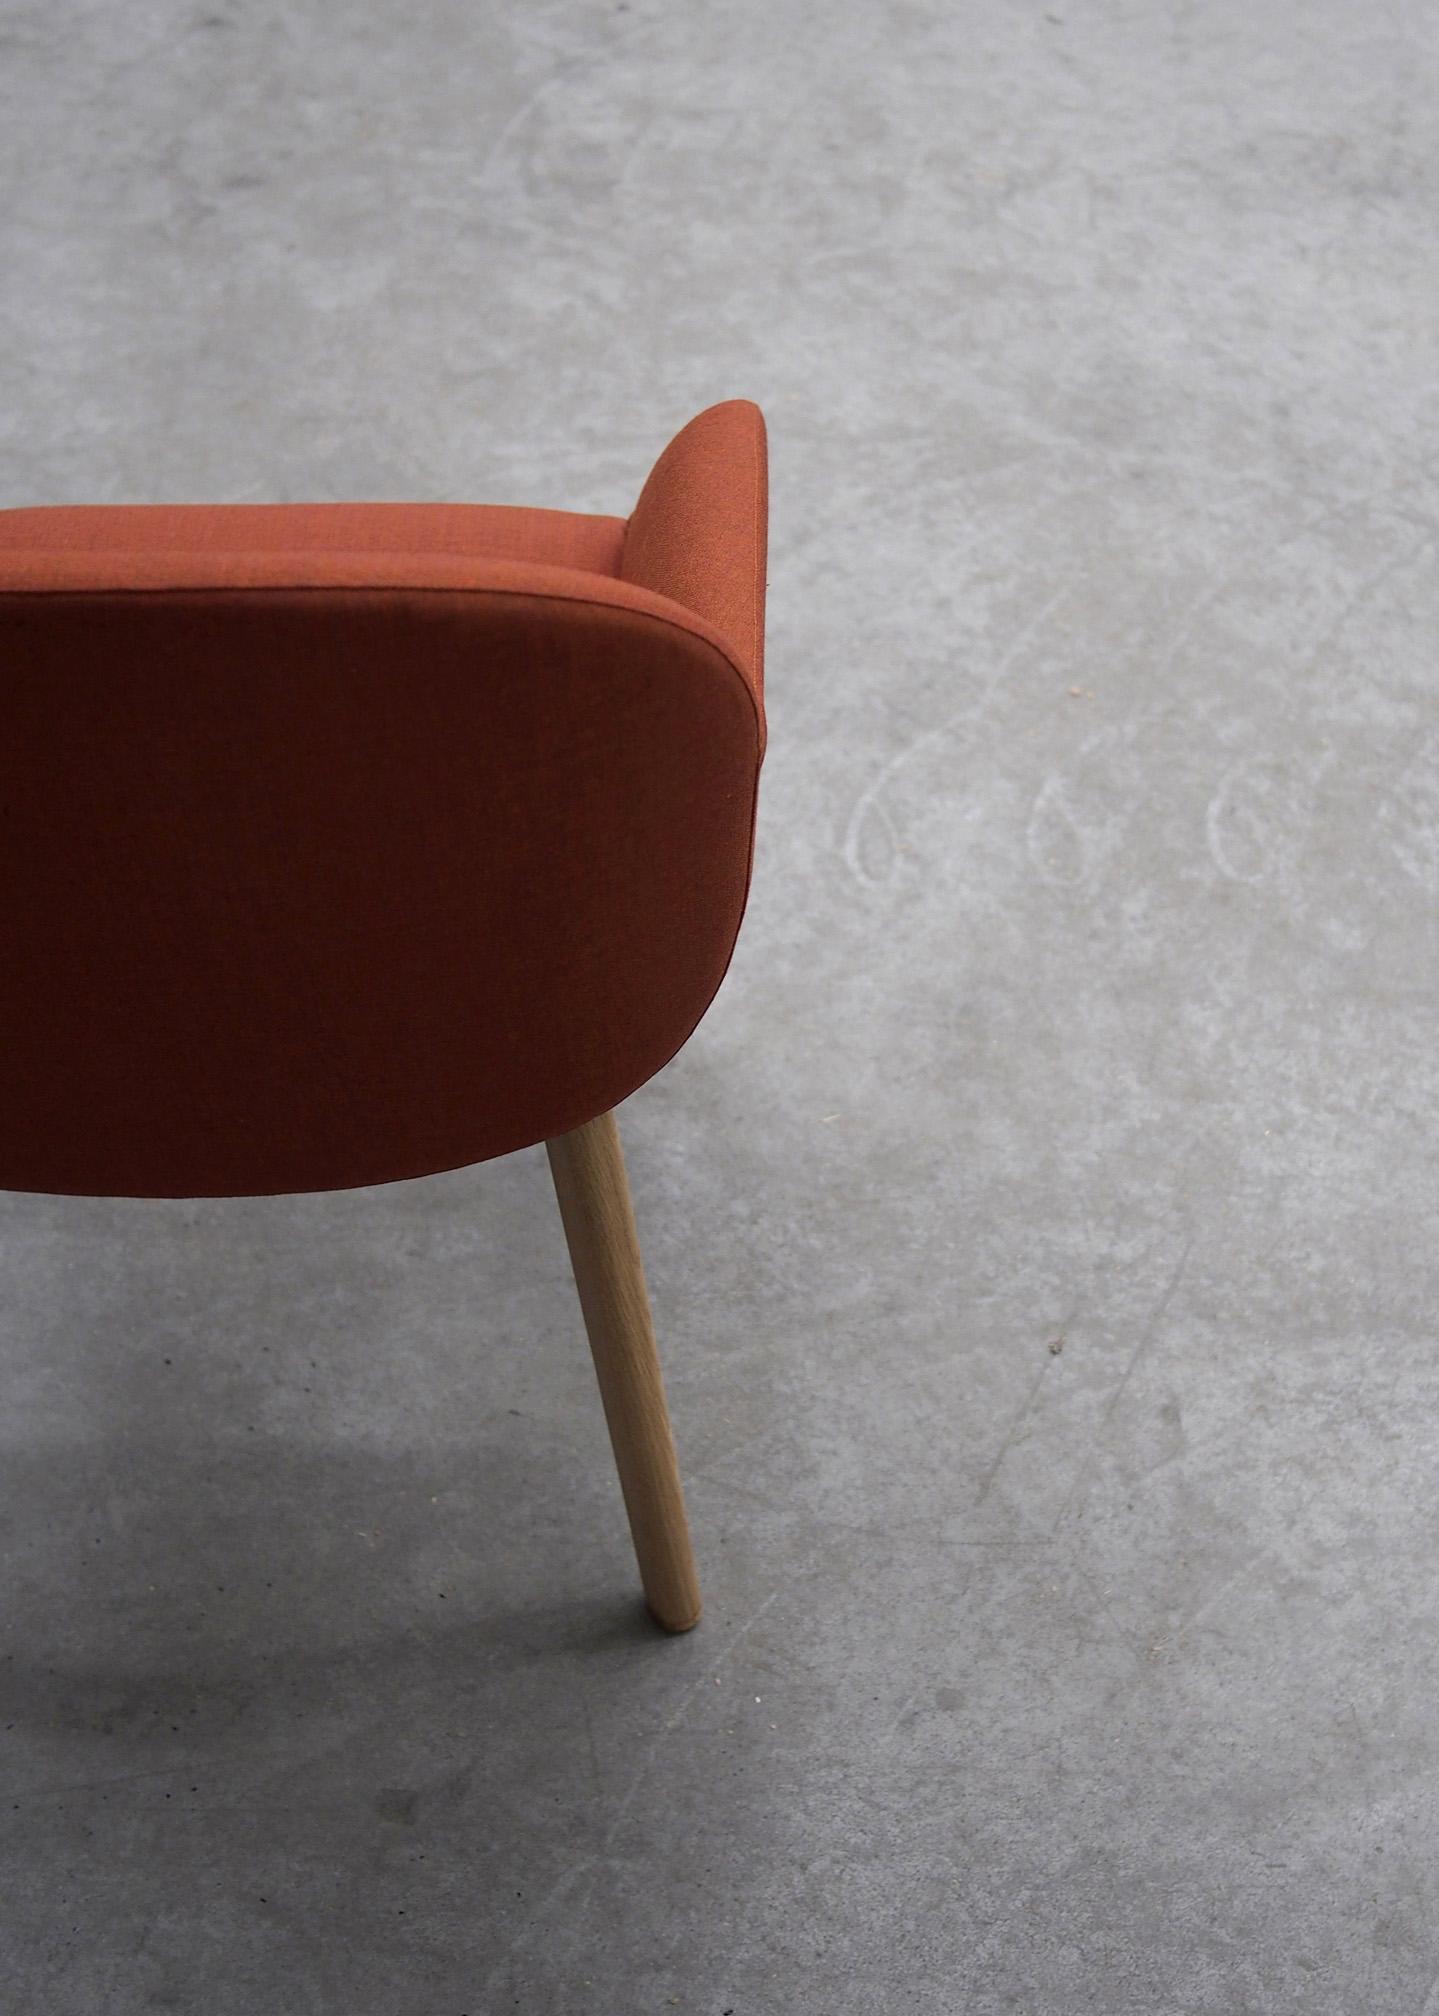 Elba chair prototype in the warehouse